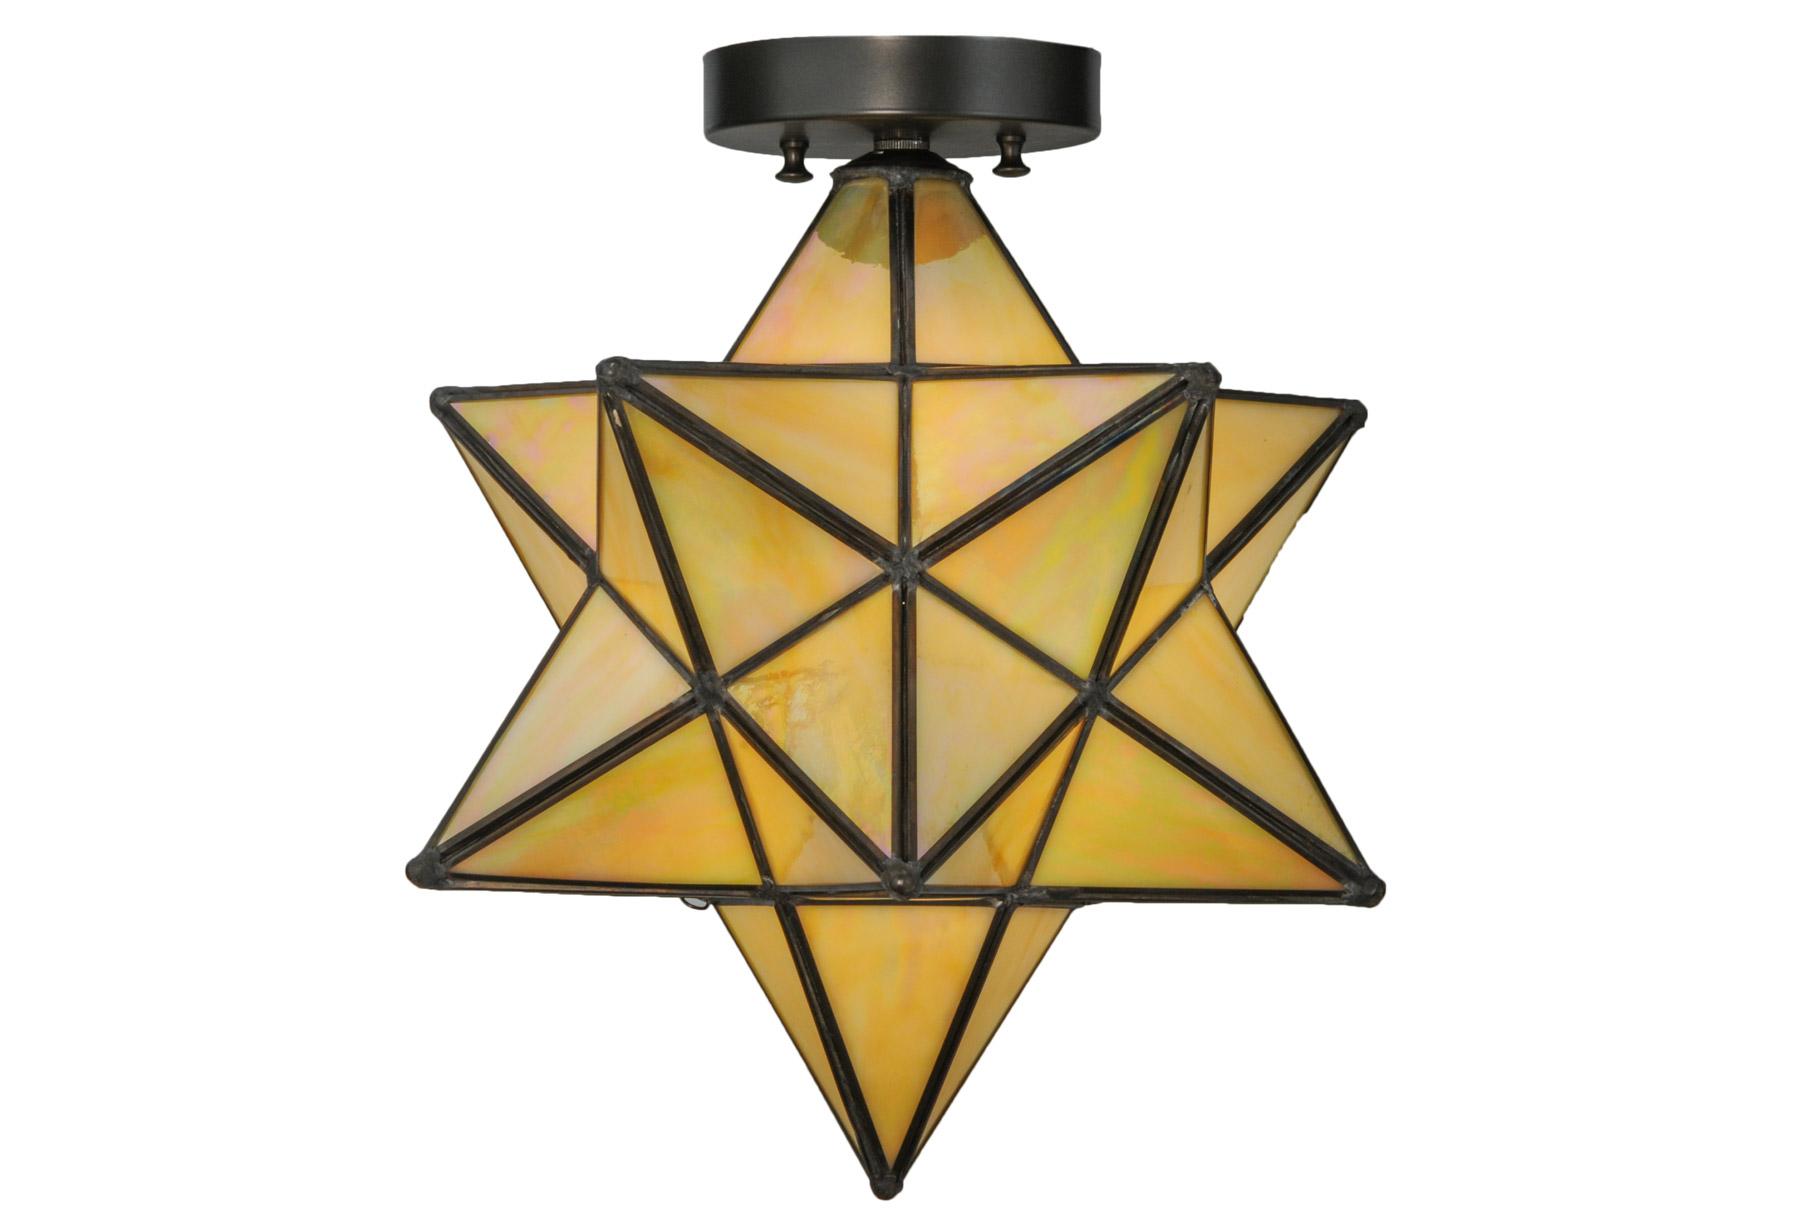 Meyda 148883 Moravian Star Flush Mount Ceiling Fixture